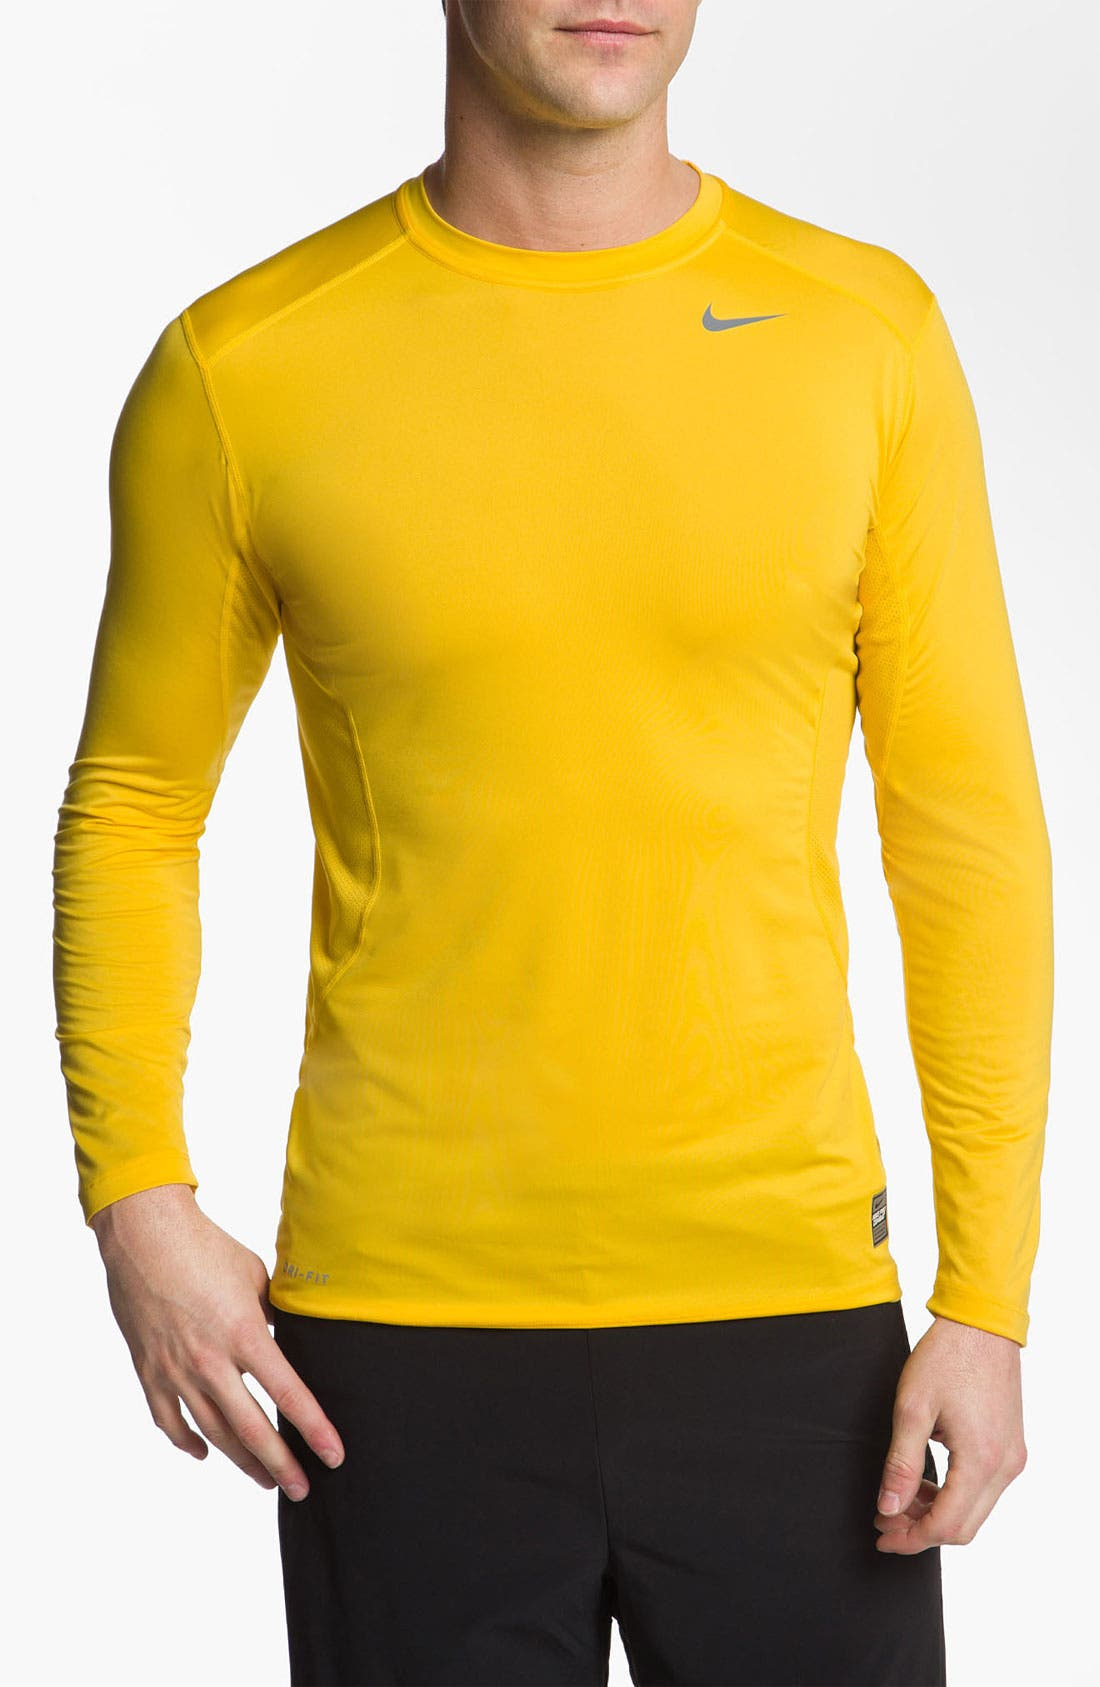 Main Image - Nike 'Core 2.0' Fitted Long Sleeve T-Shirt (Regular Retail Price: $32.00)